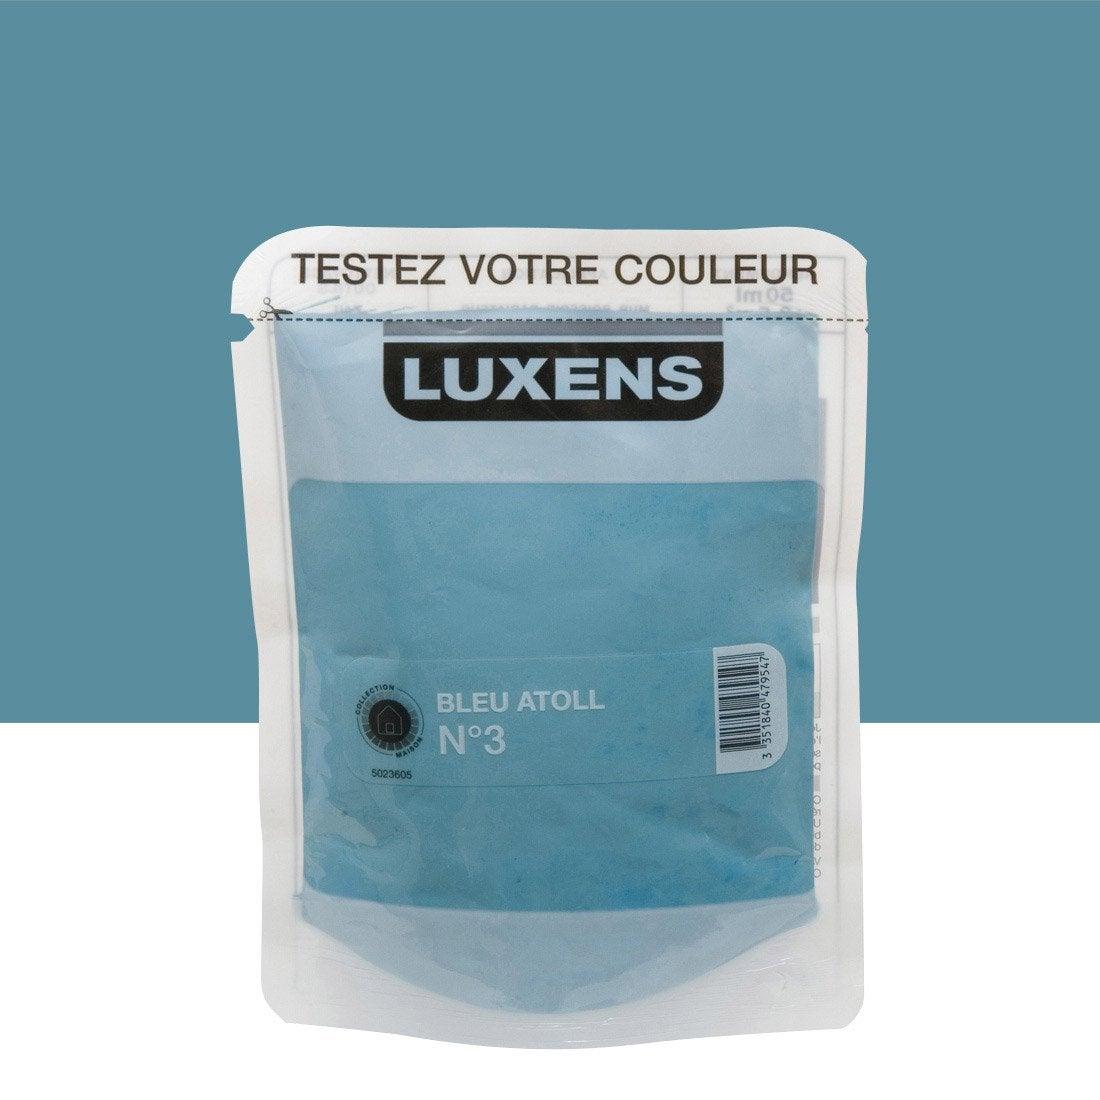 testeur peinture bleu atoll 3 luxens couleurs int rieures satin l leroy merlin. Black Bedroom Furniture Sets. Home Design Ideas